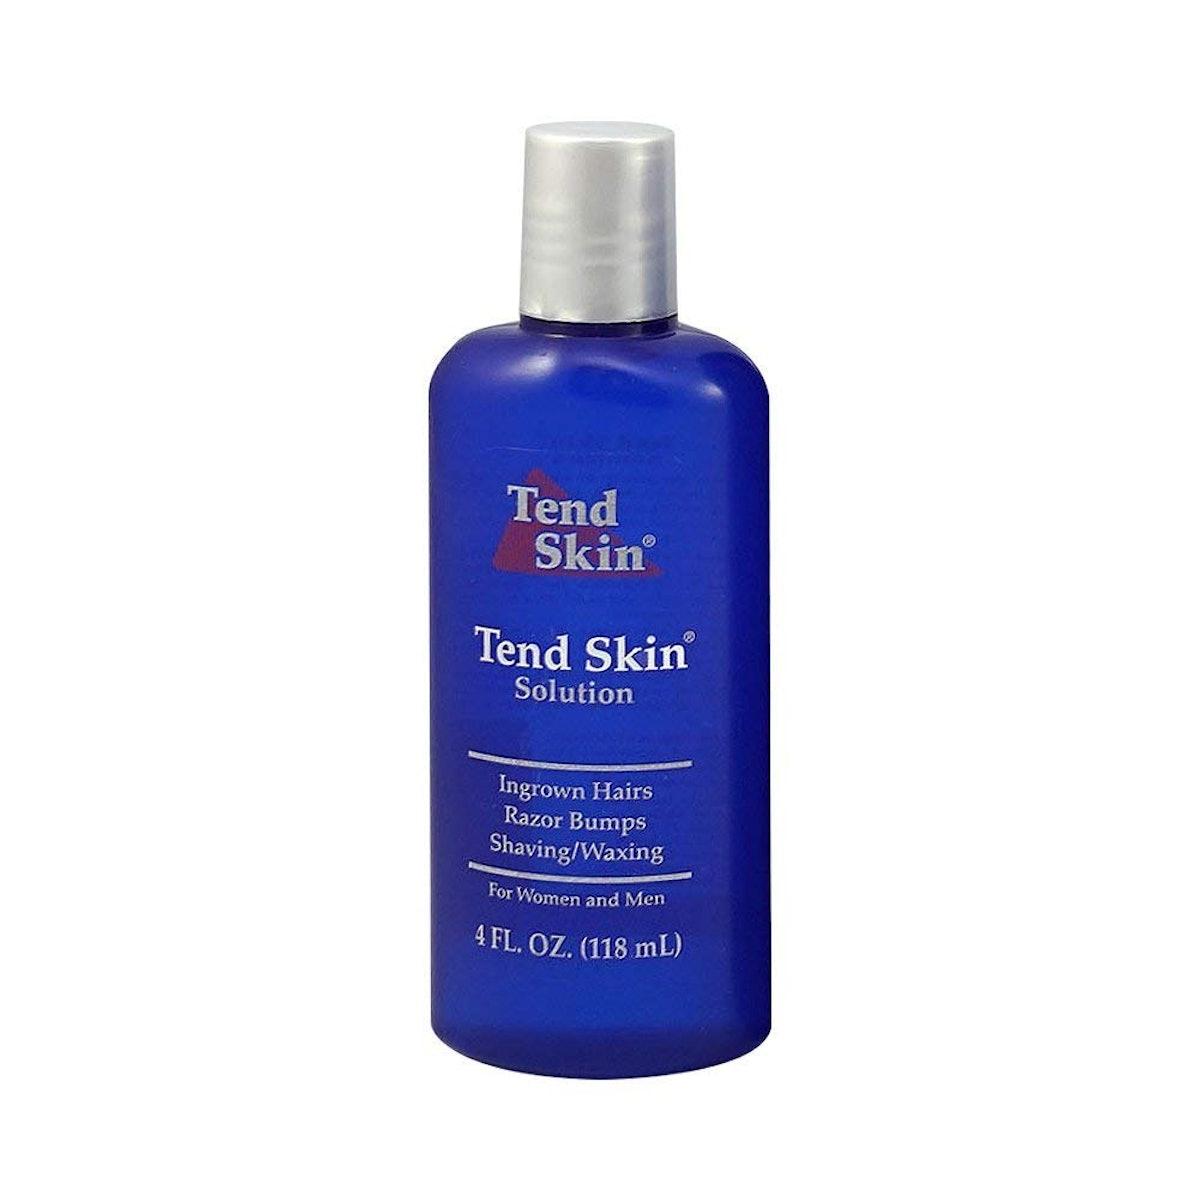 Tend Skin Shaving Treatment